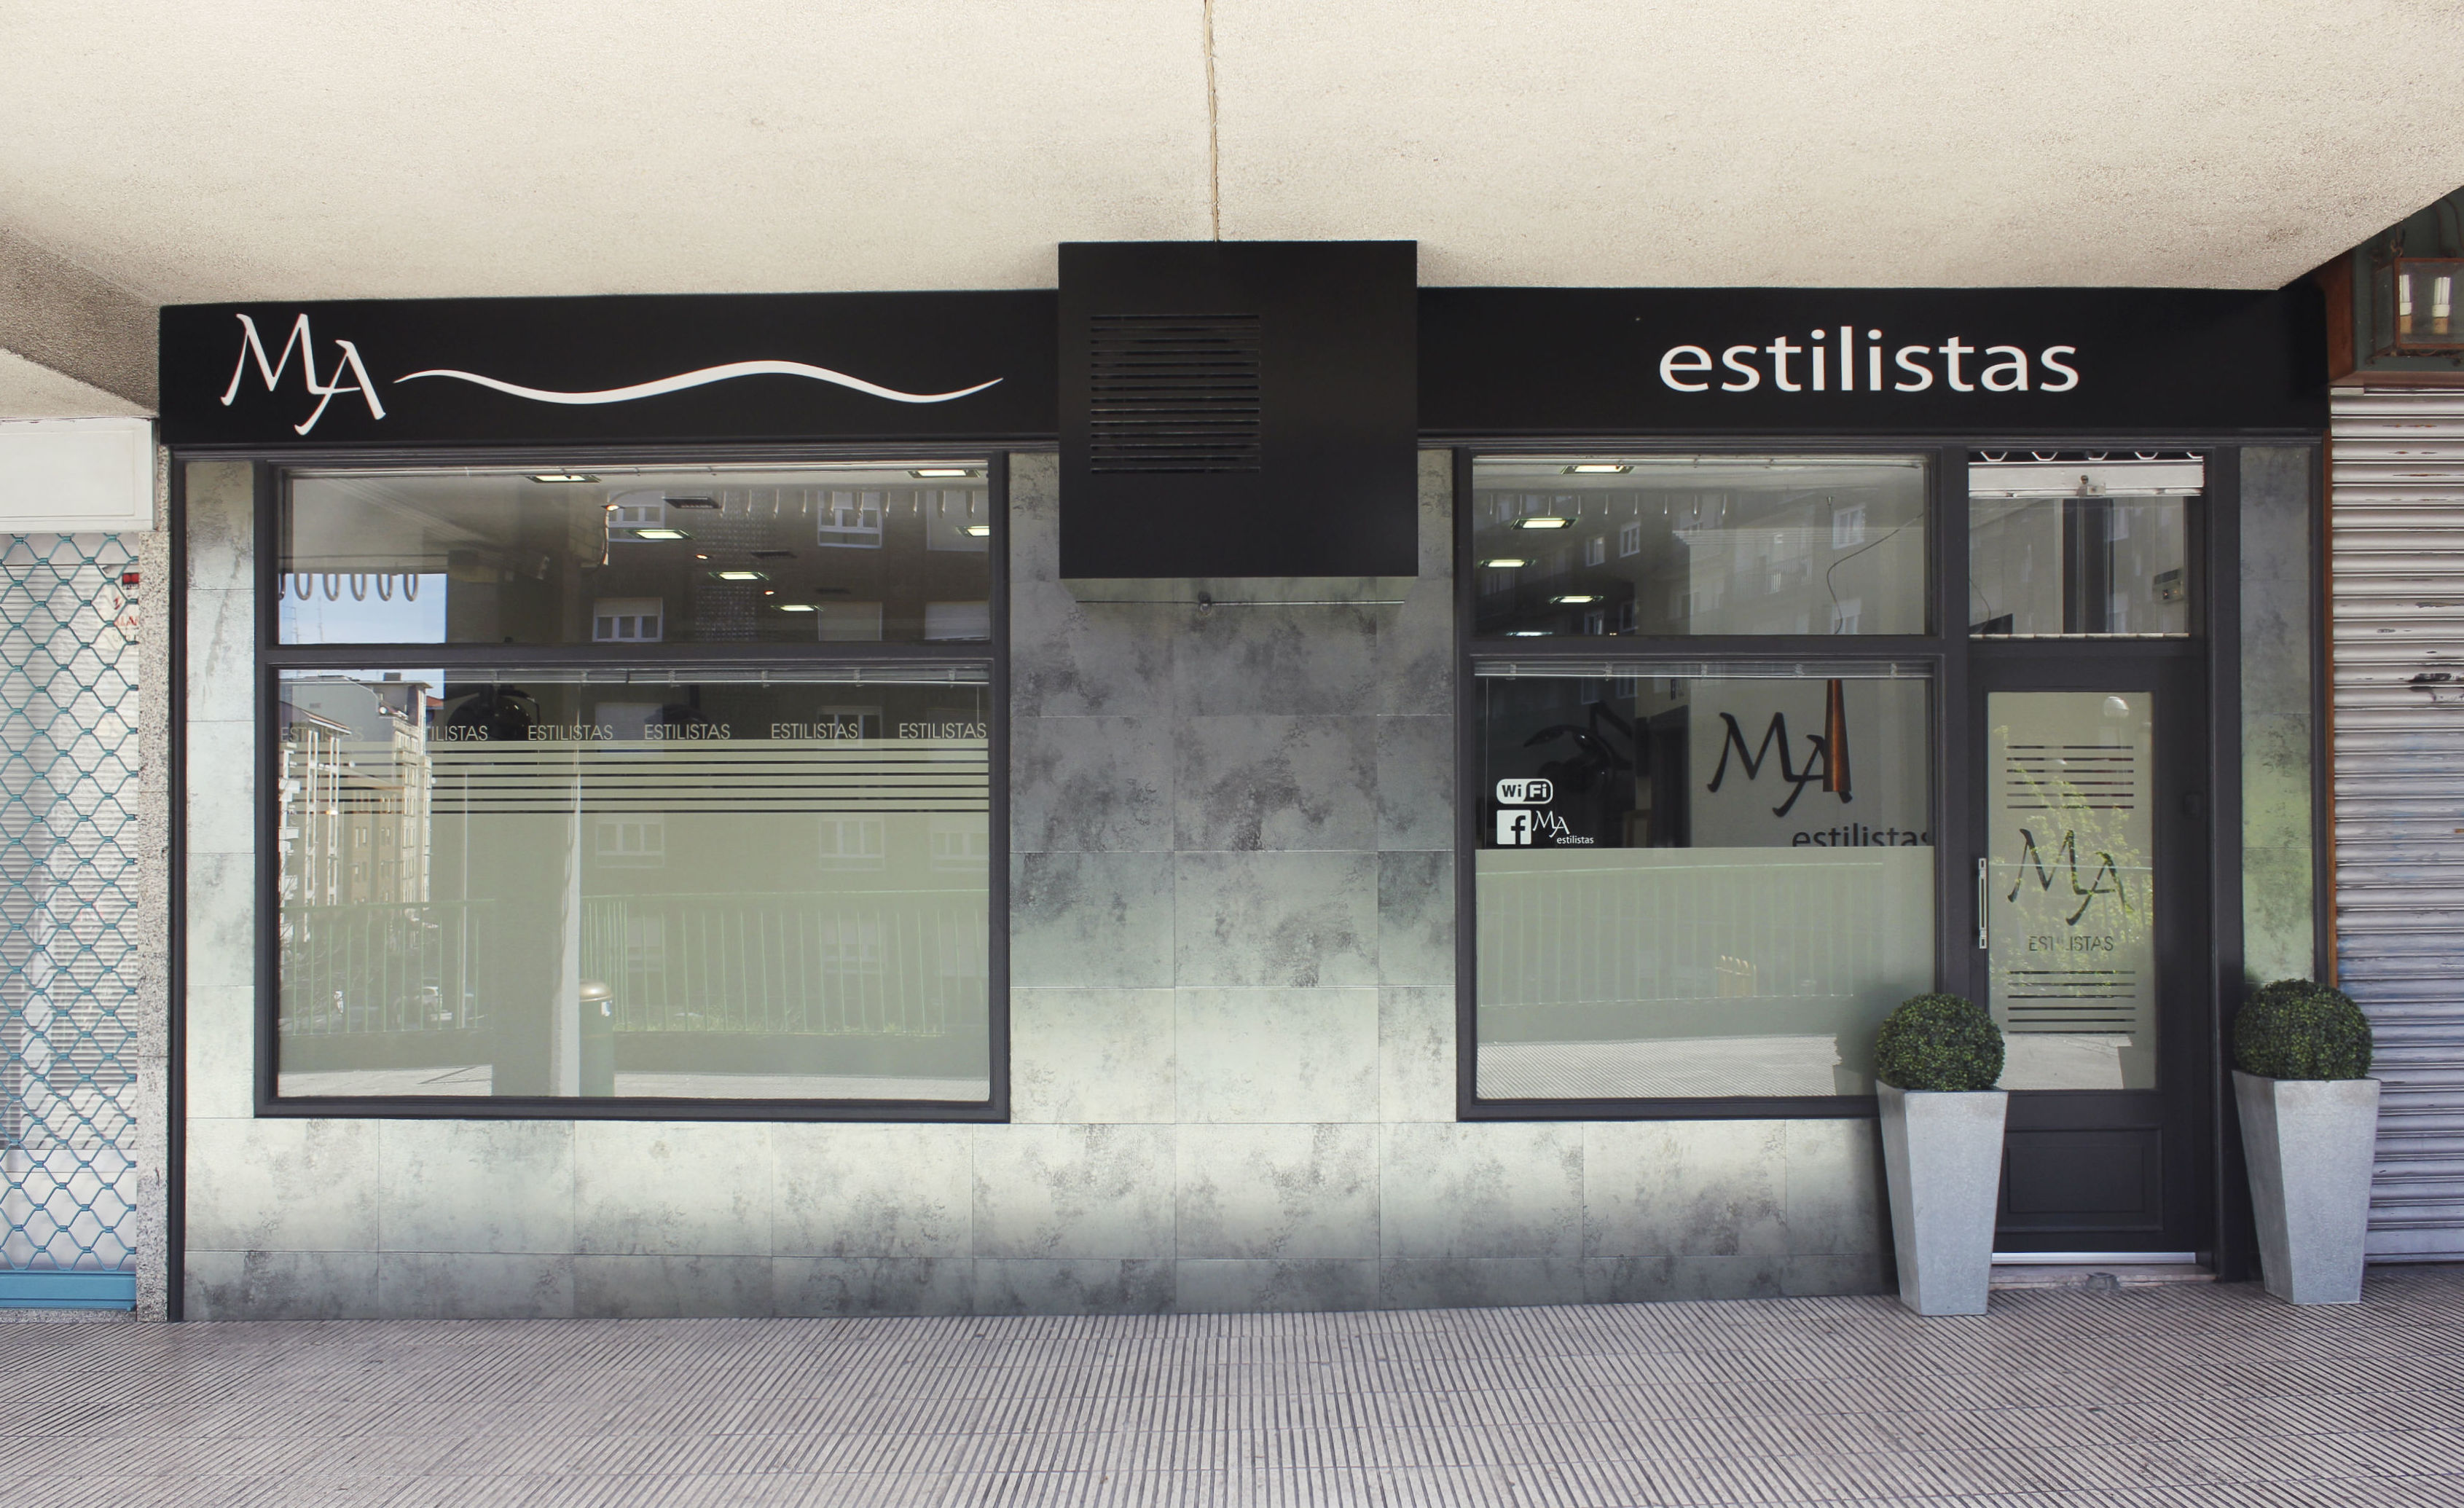 M.A. estilistas | Peluquerías en Bilbao